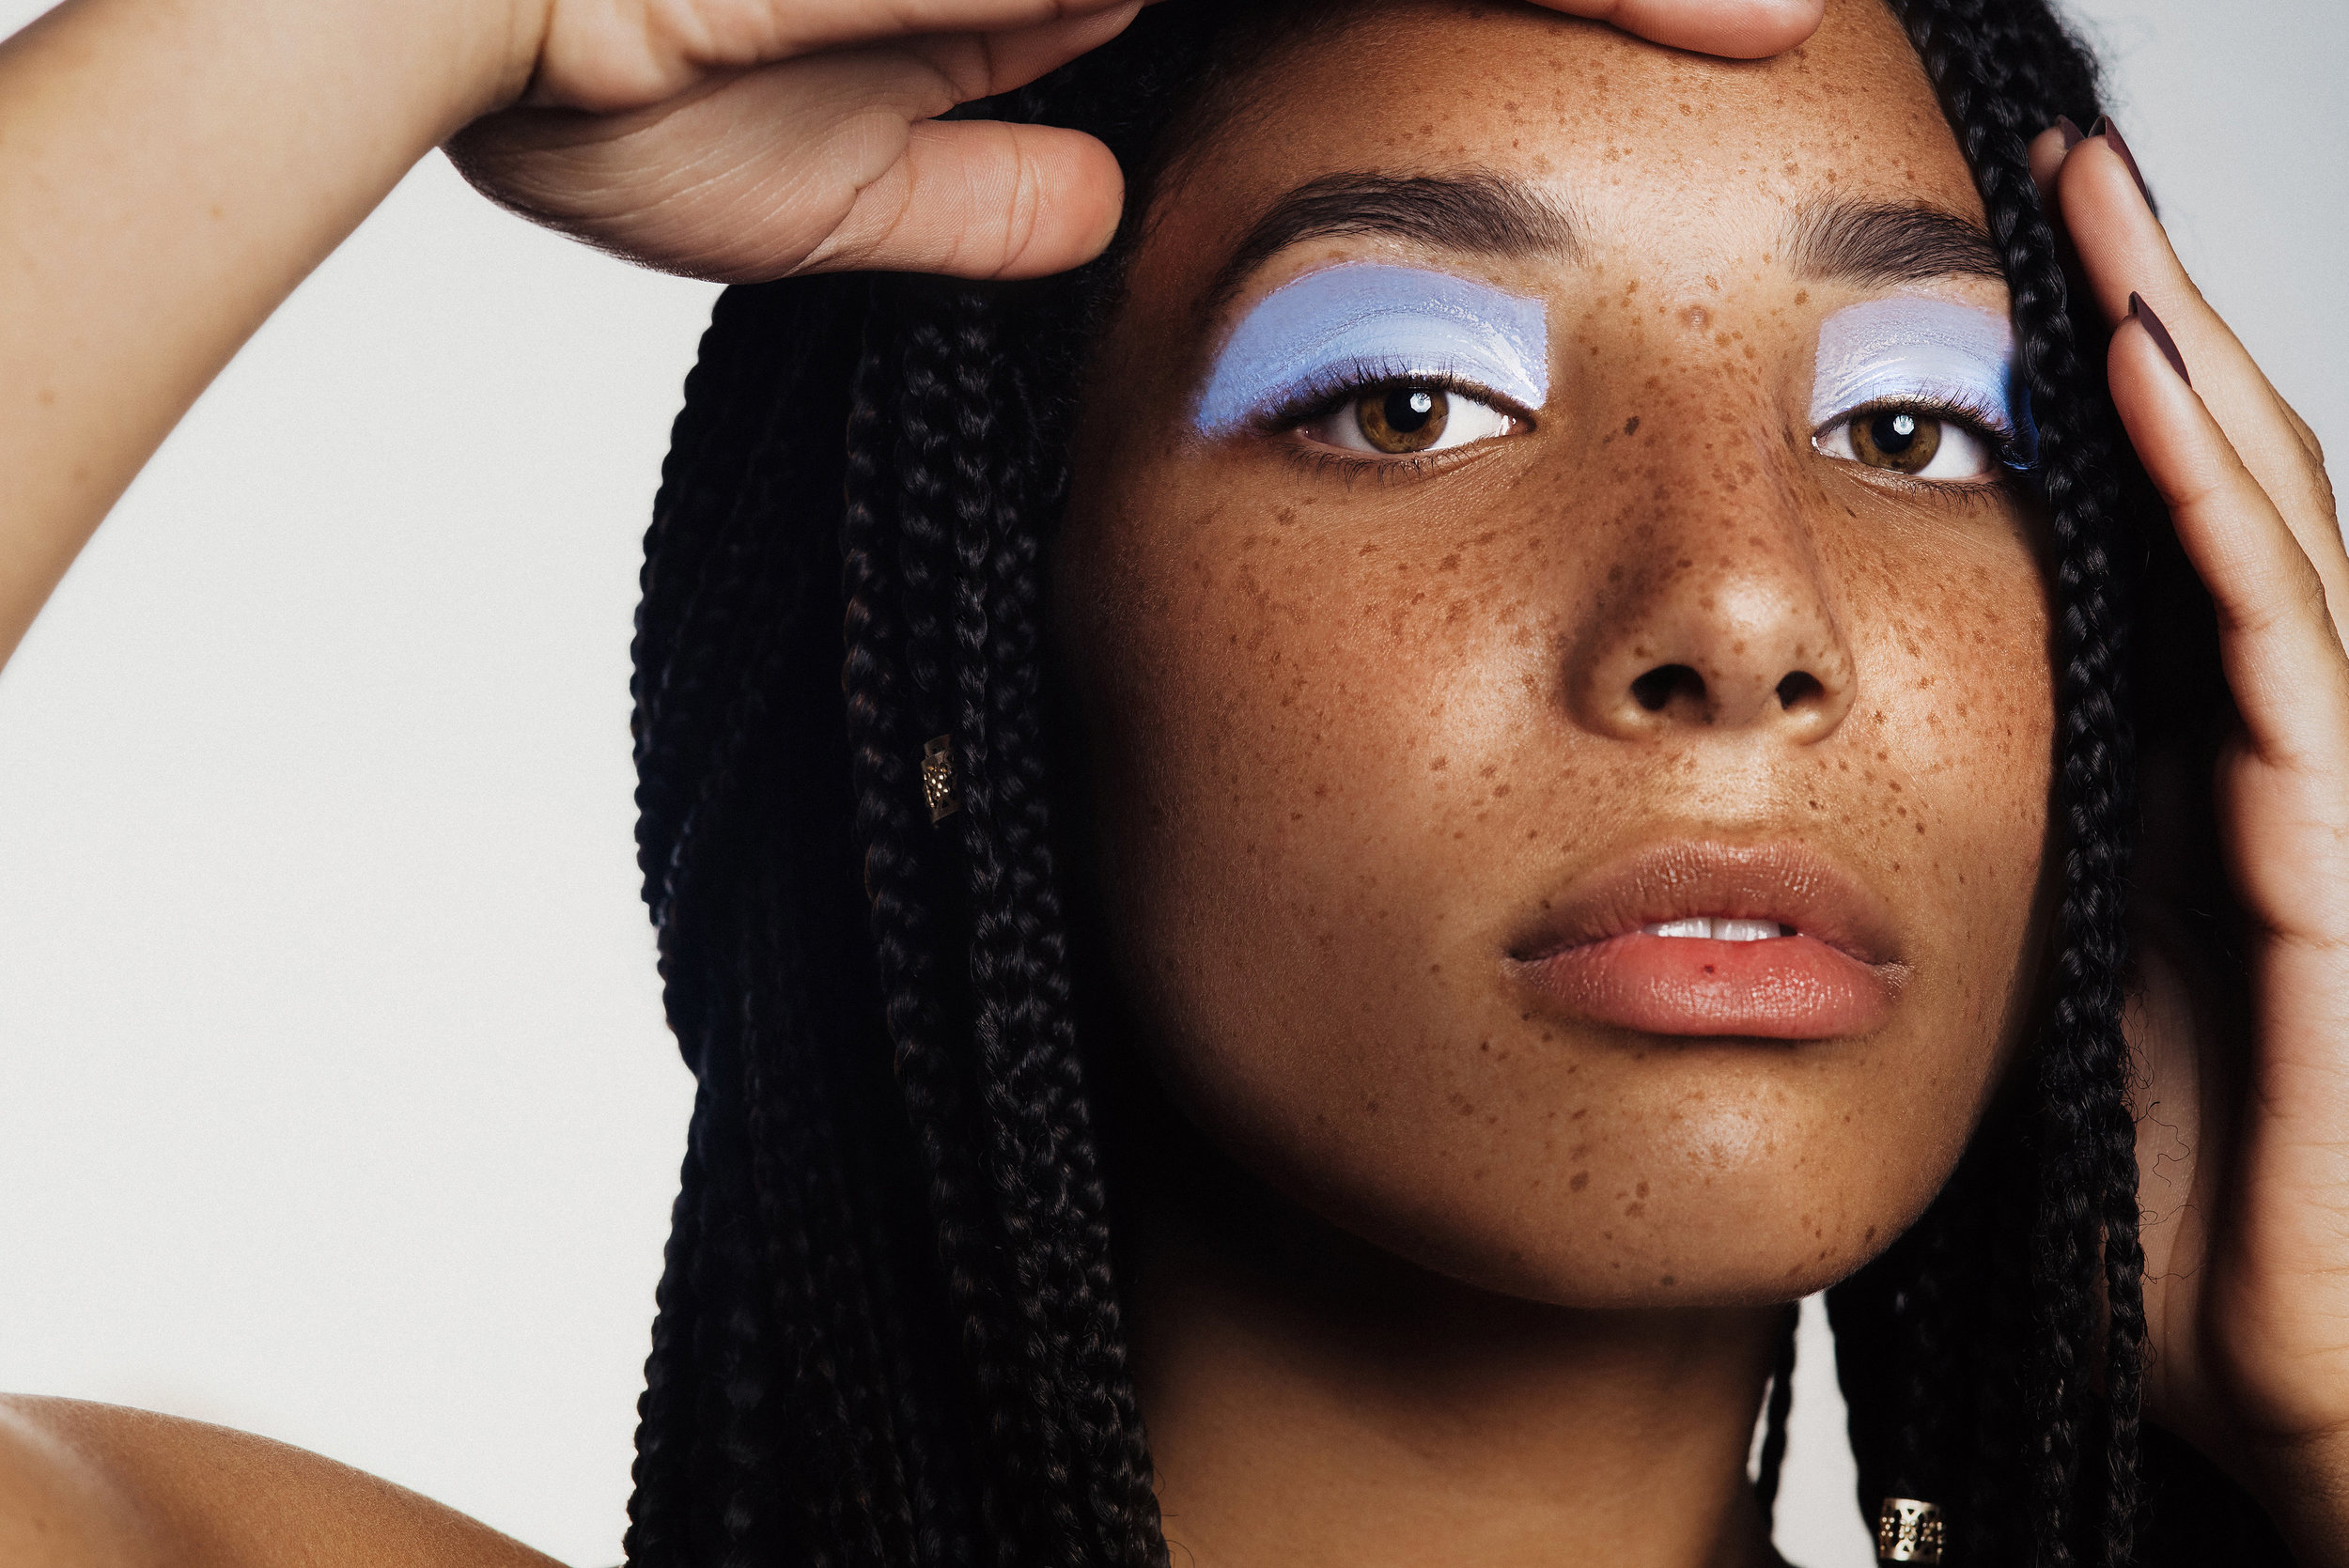 Color Block  Photographer: Eden Strader  Model: Aubree Clark  Makeup Artist: Abigail Hill